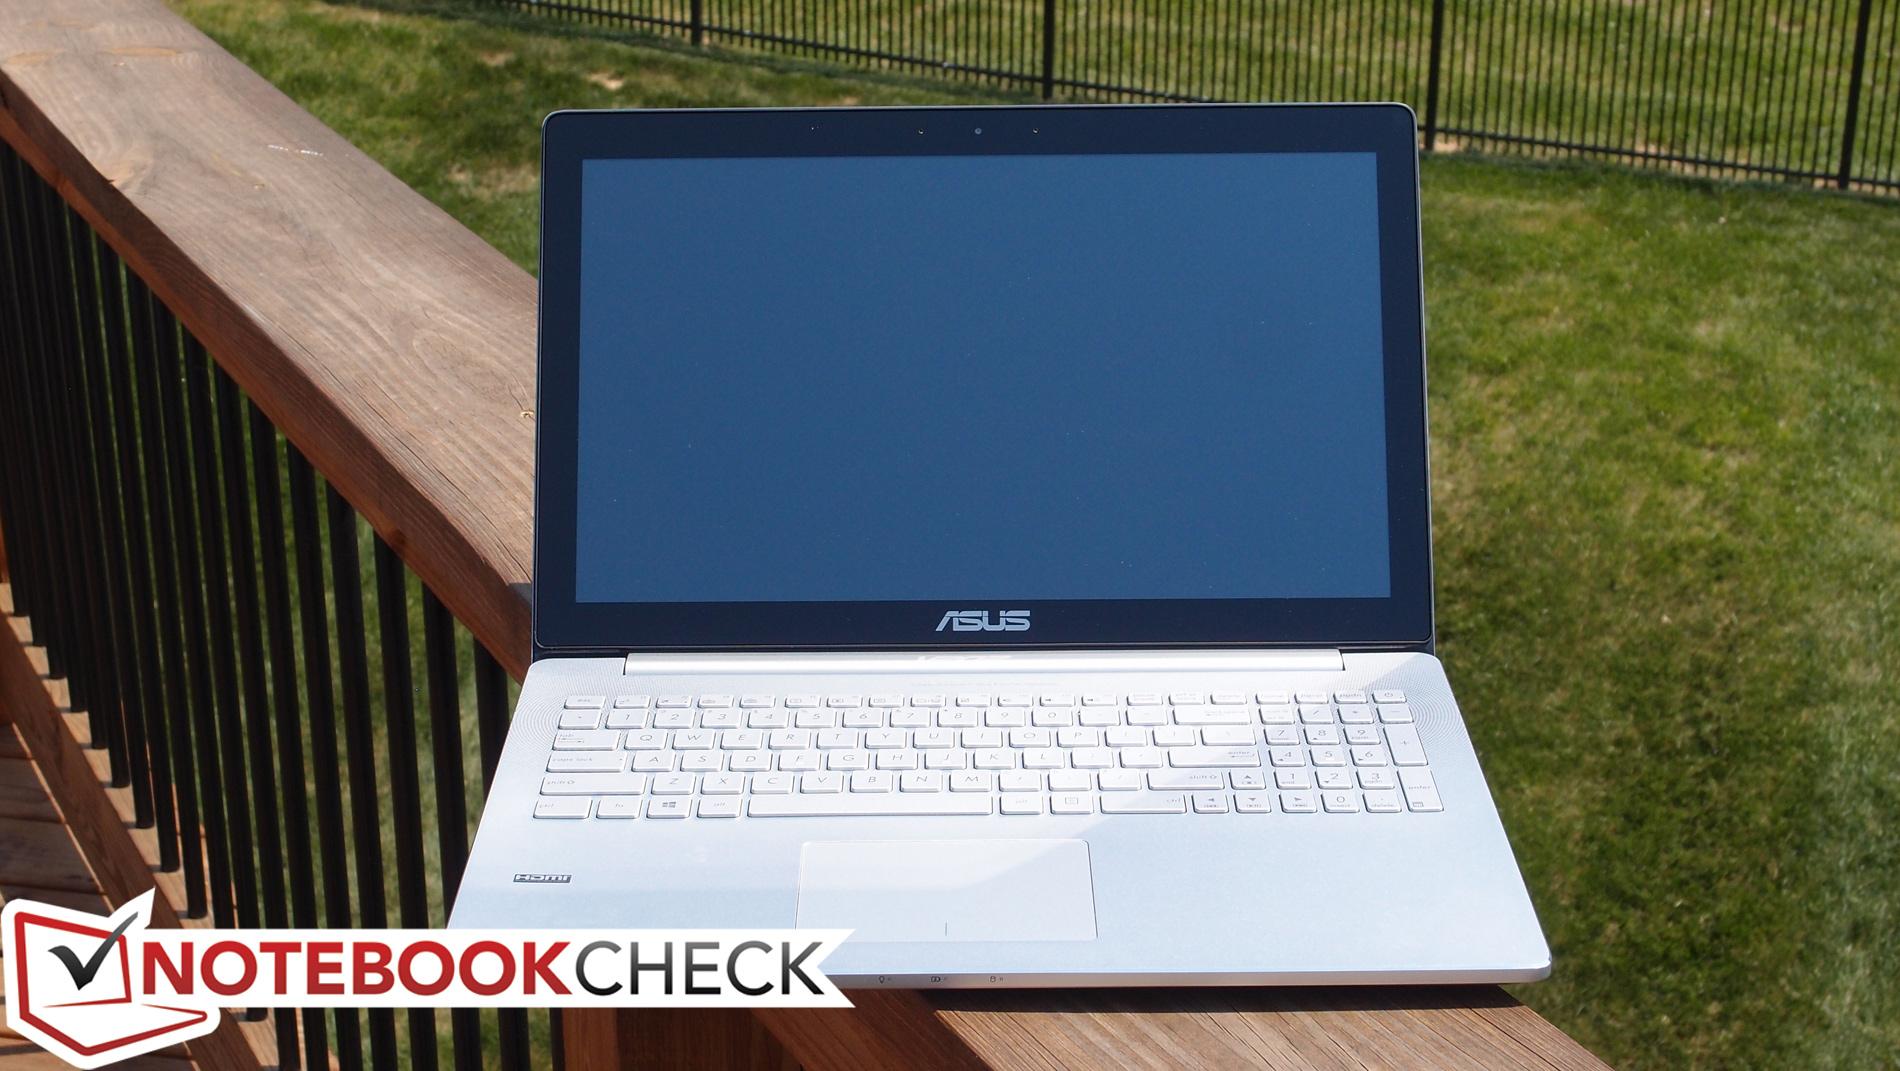 Asus ZenBook Pro UX501JW Drivers for Windows Mac